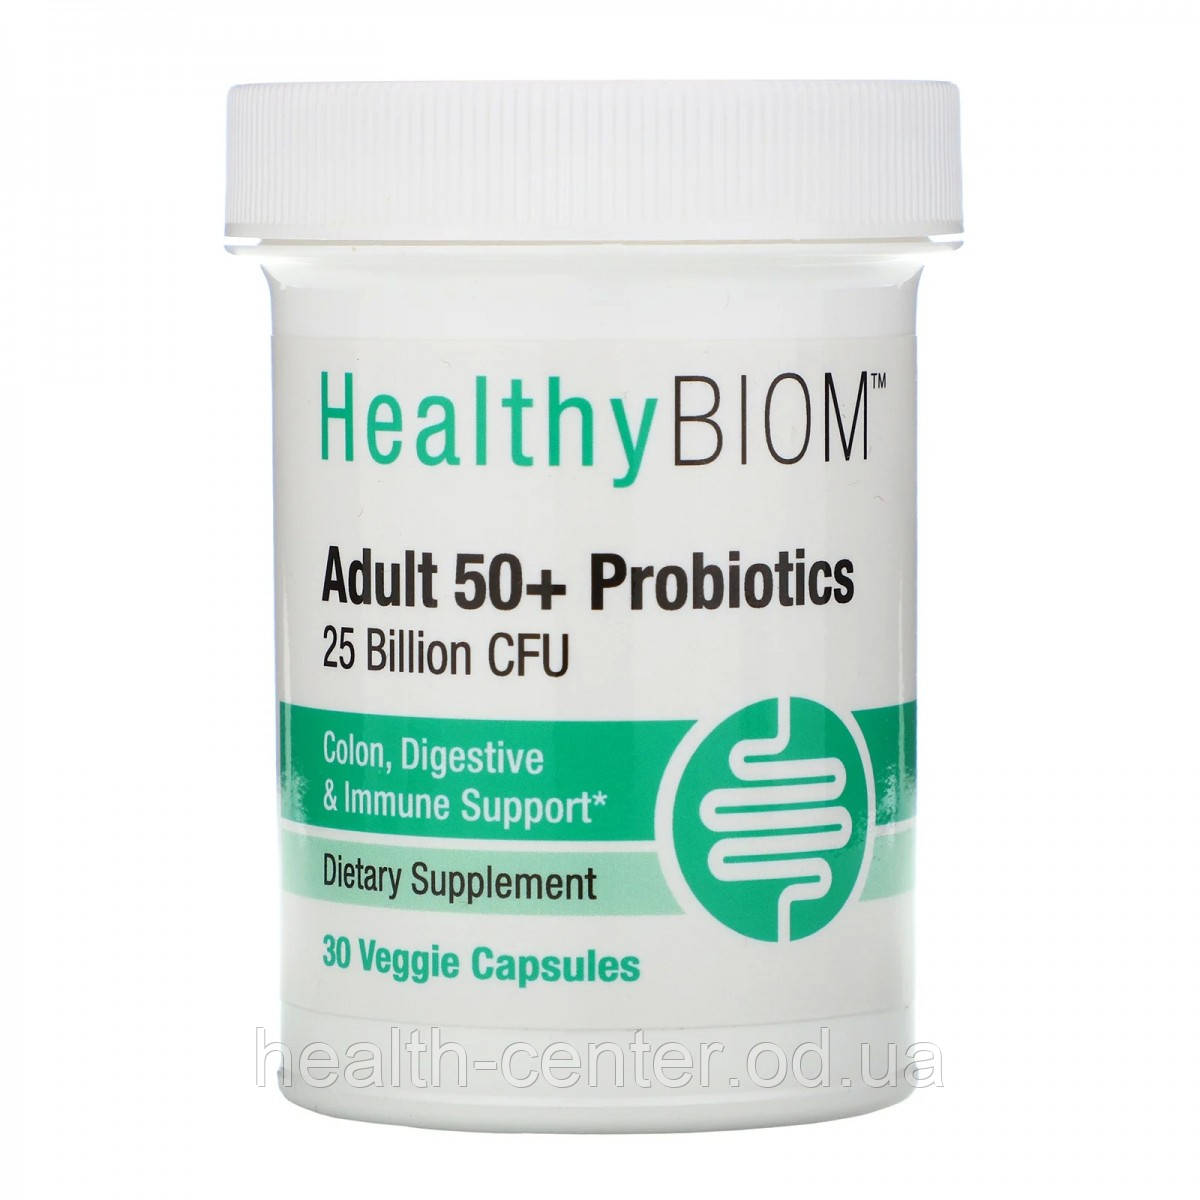 Пробиотики для взрослых 50+, 25 млрд 30 капс лакто-бифидобактерии HealthyBiom USA